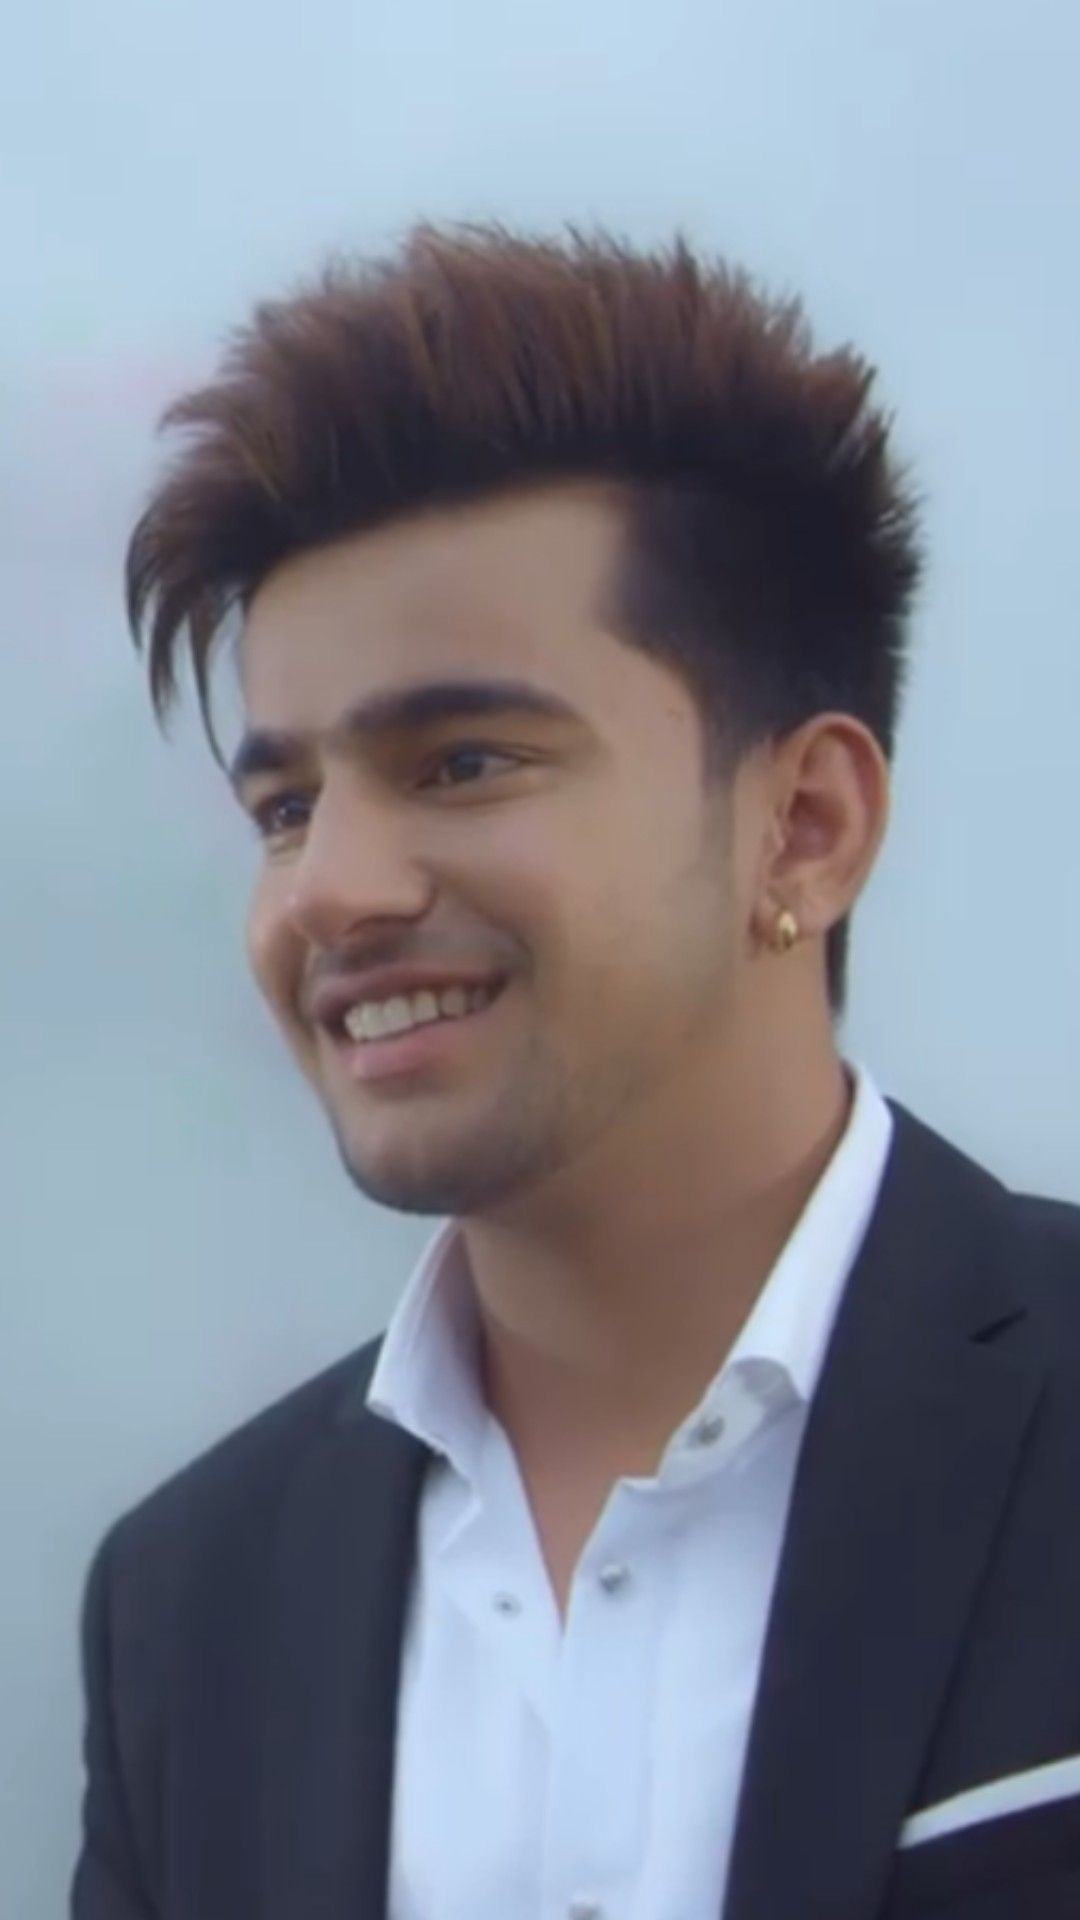 jass manak | ajay in 2019 | cute indian boys, boy hairstyles